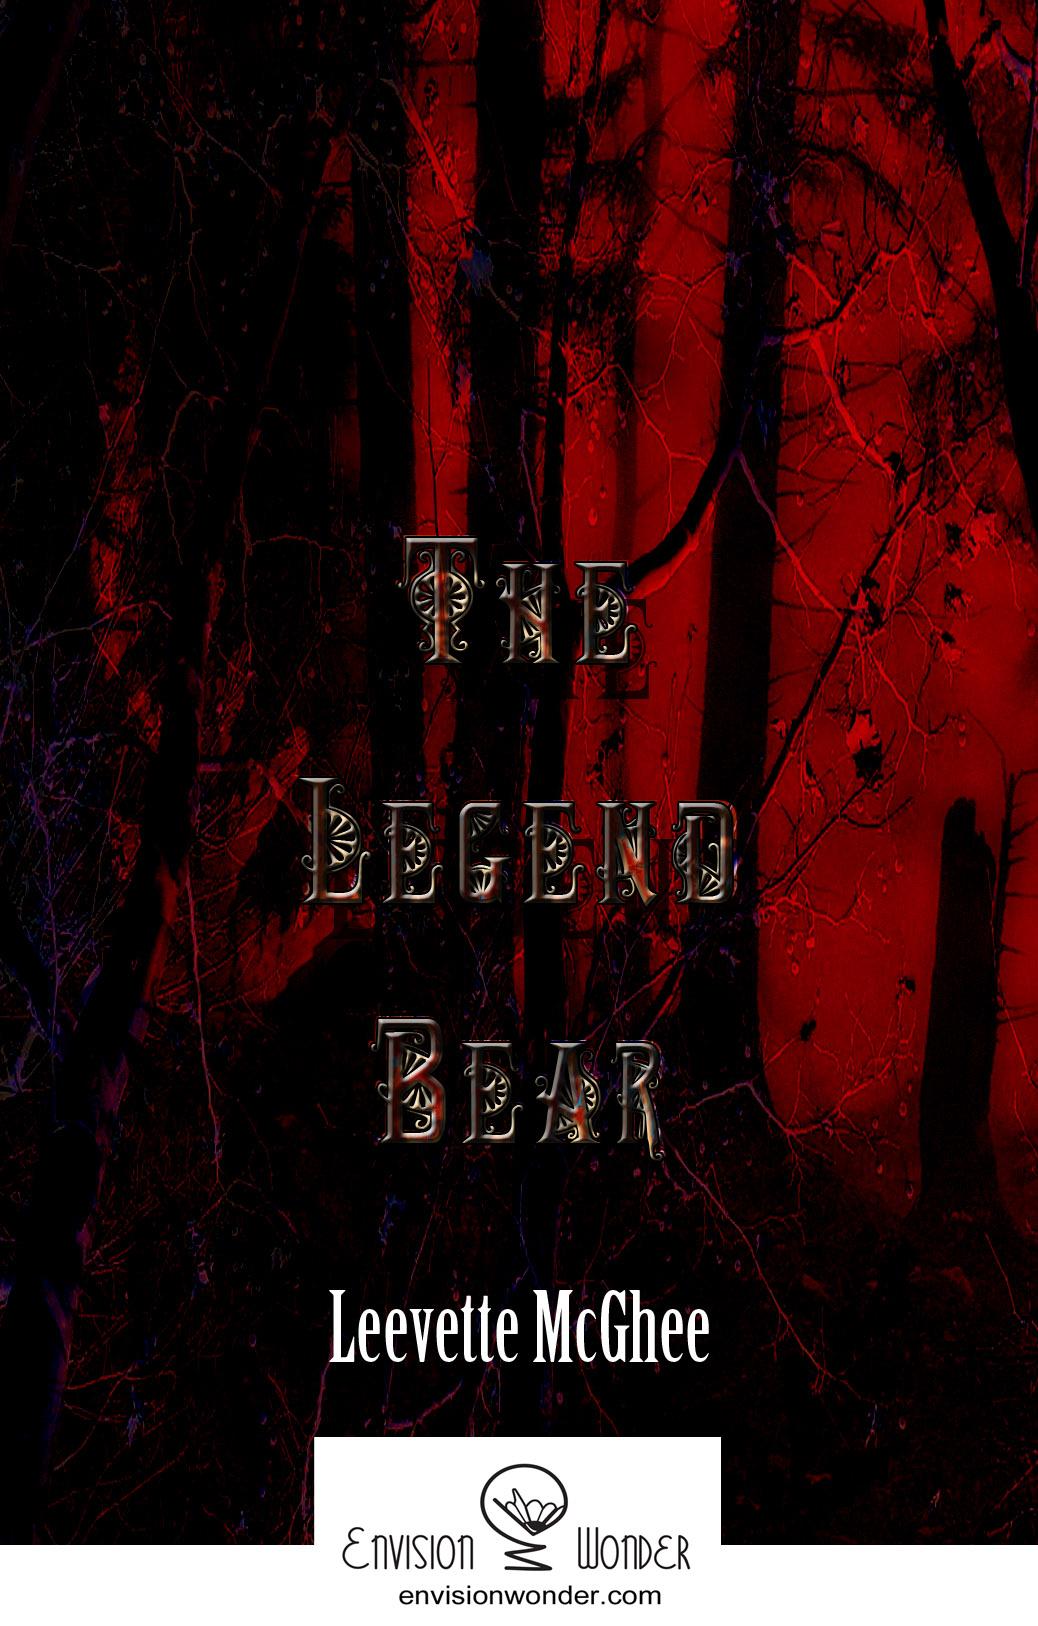 Book Covers_ TheLegendBear_LeevetteMcghee